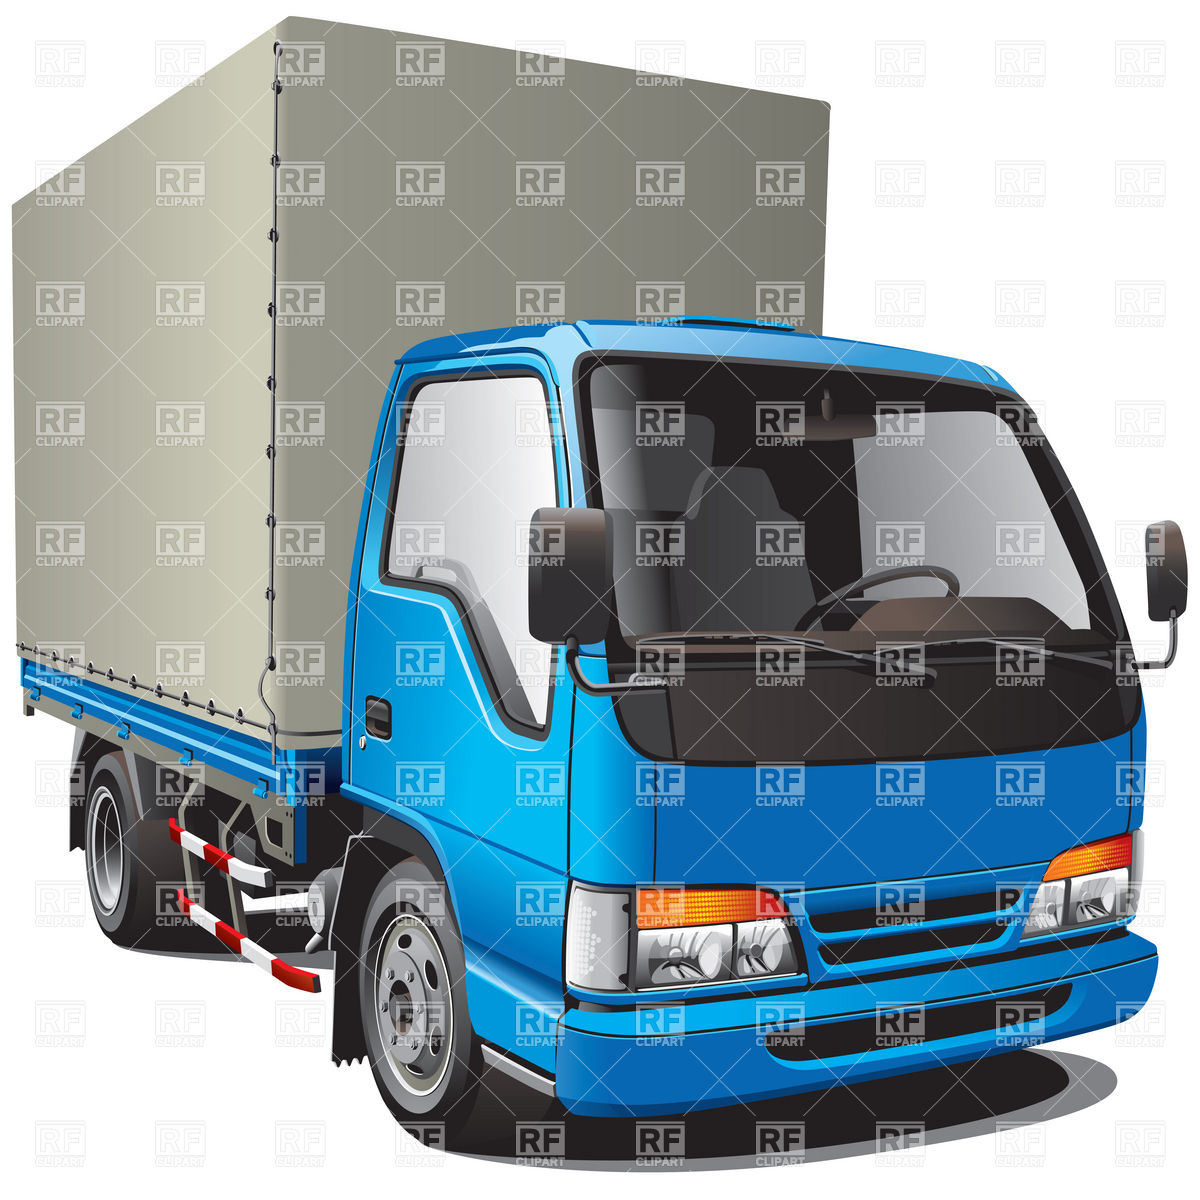 1200x1200 Small Blue Cargo Truck Vector Image Vector Artwork Of